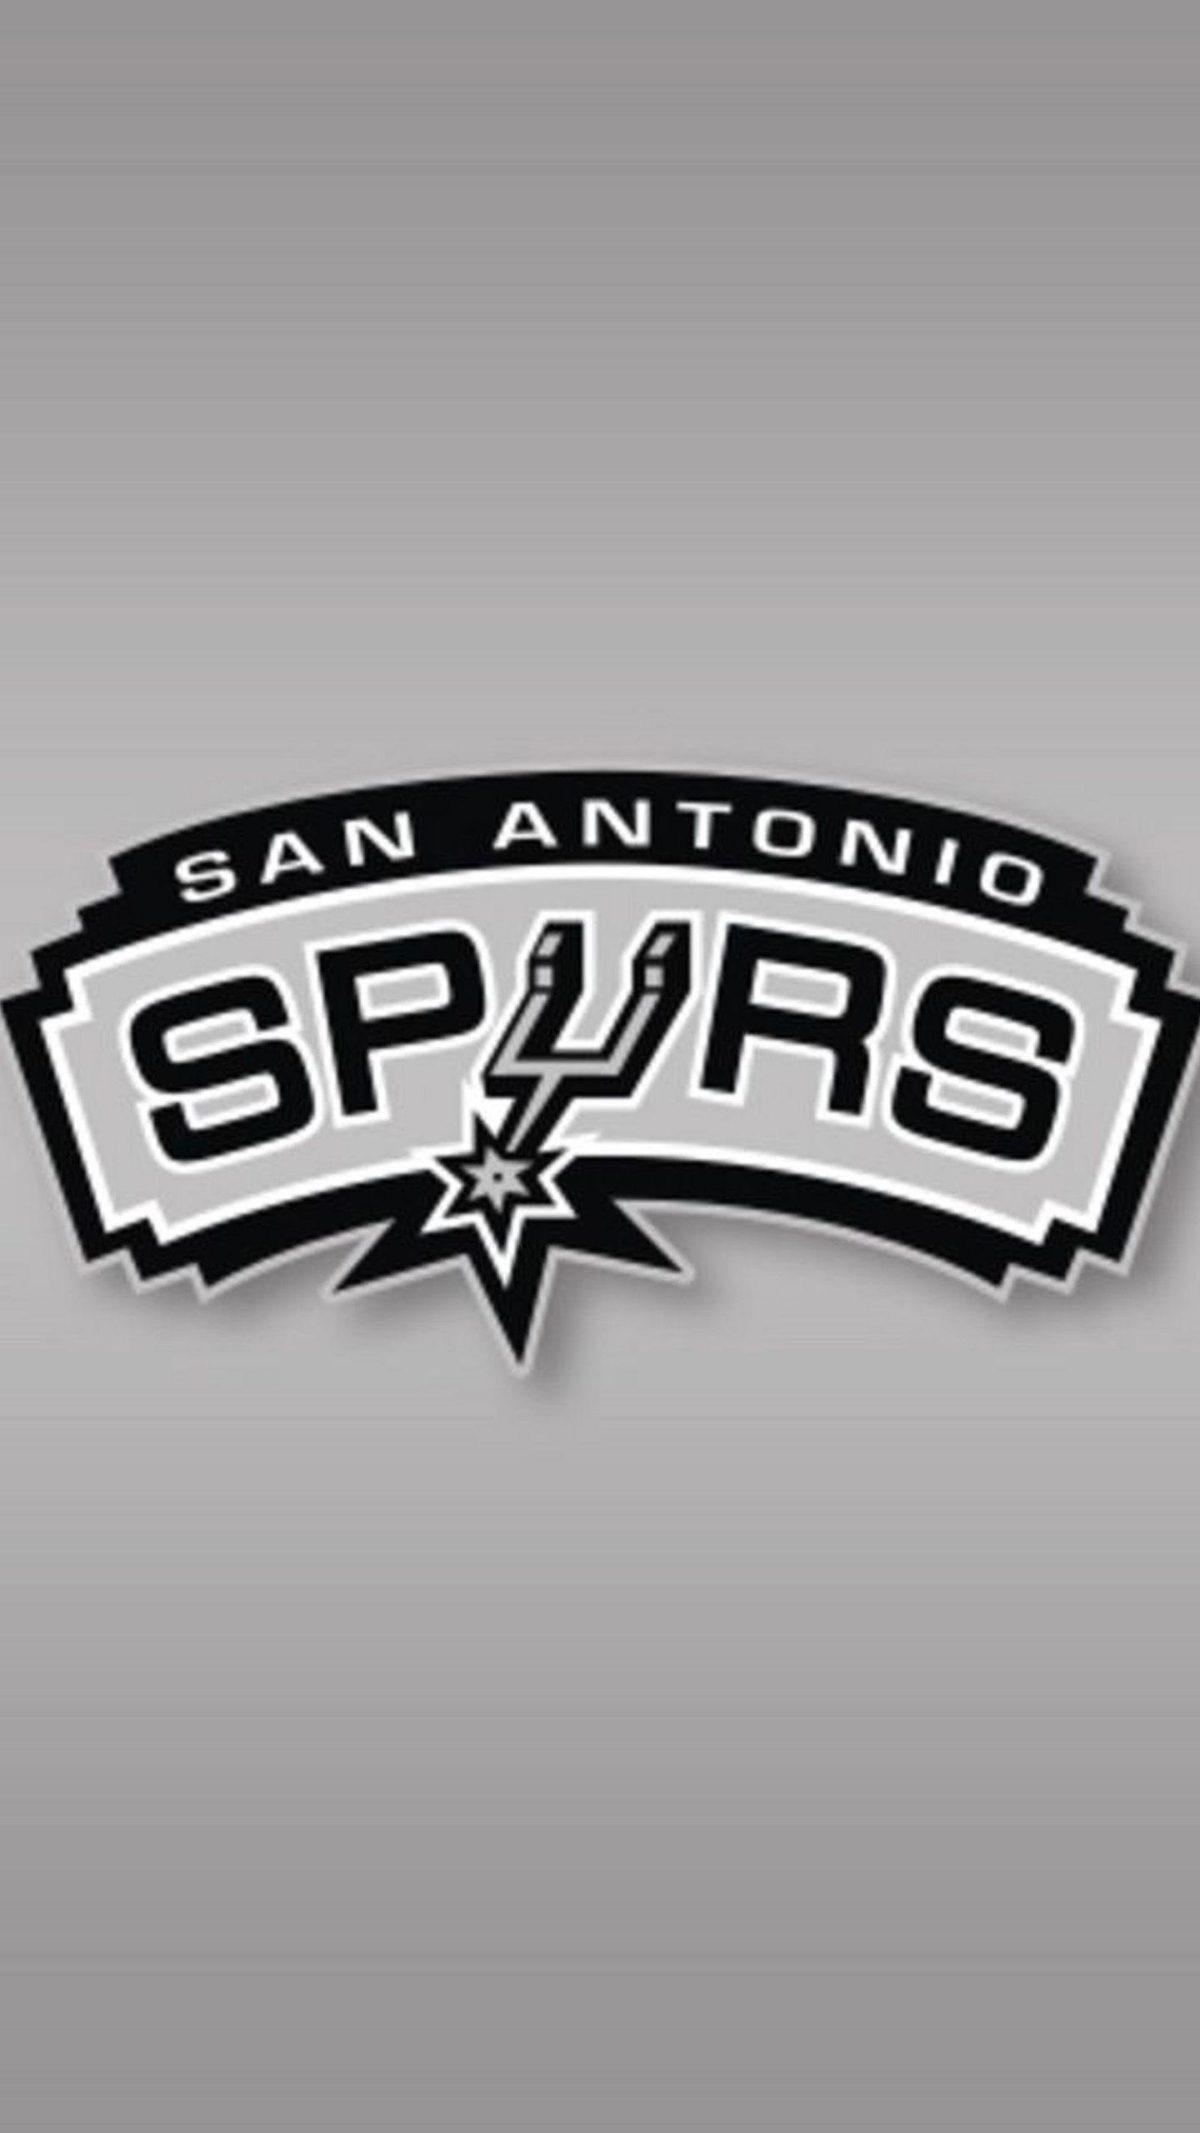 San Antonio Spurs wallpapers for galaxy S6.jpg